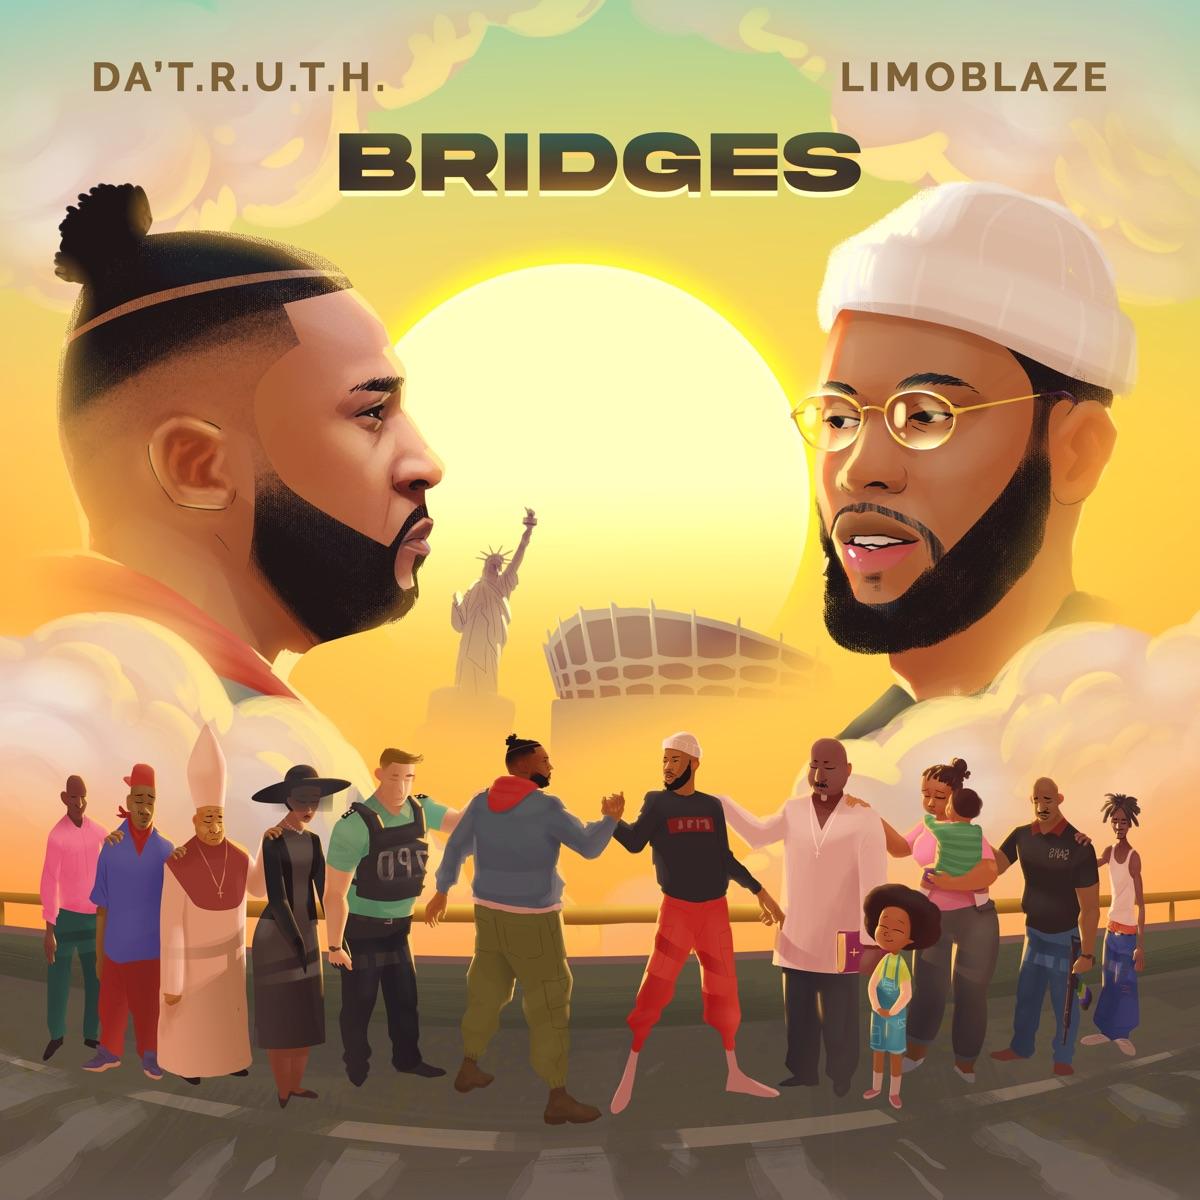 [Album] Bridges - Da' T.R.U.T.H & LIMOBLAZE (Download Mp3)